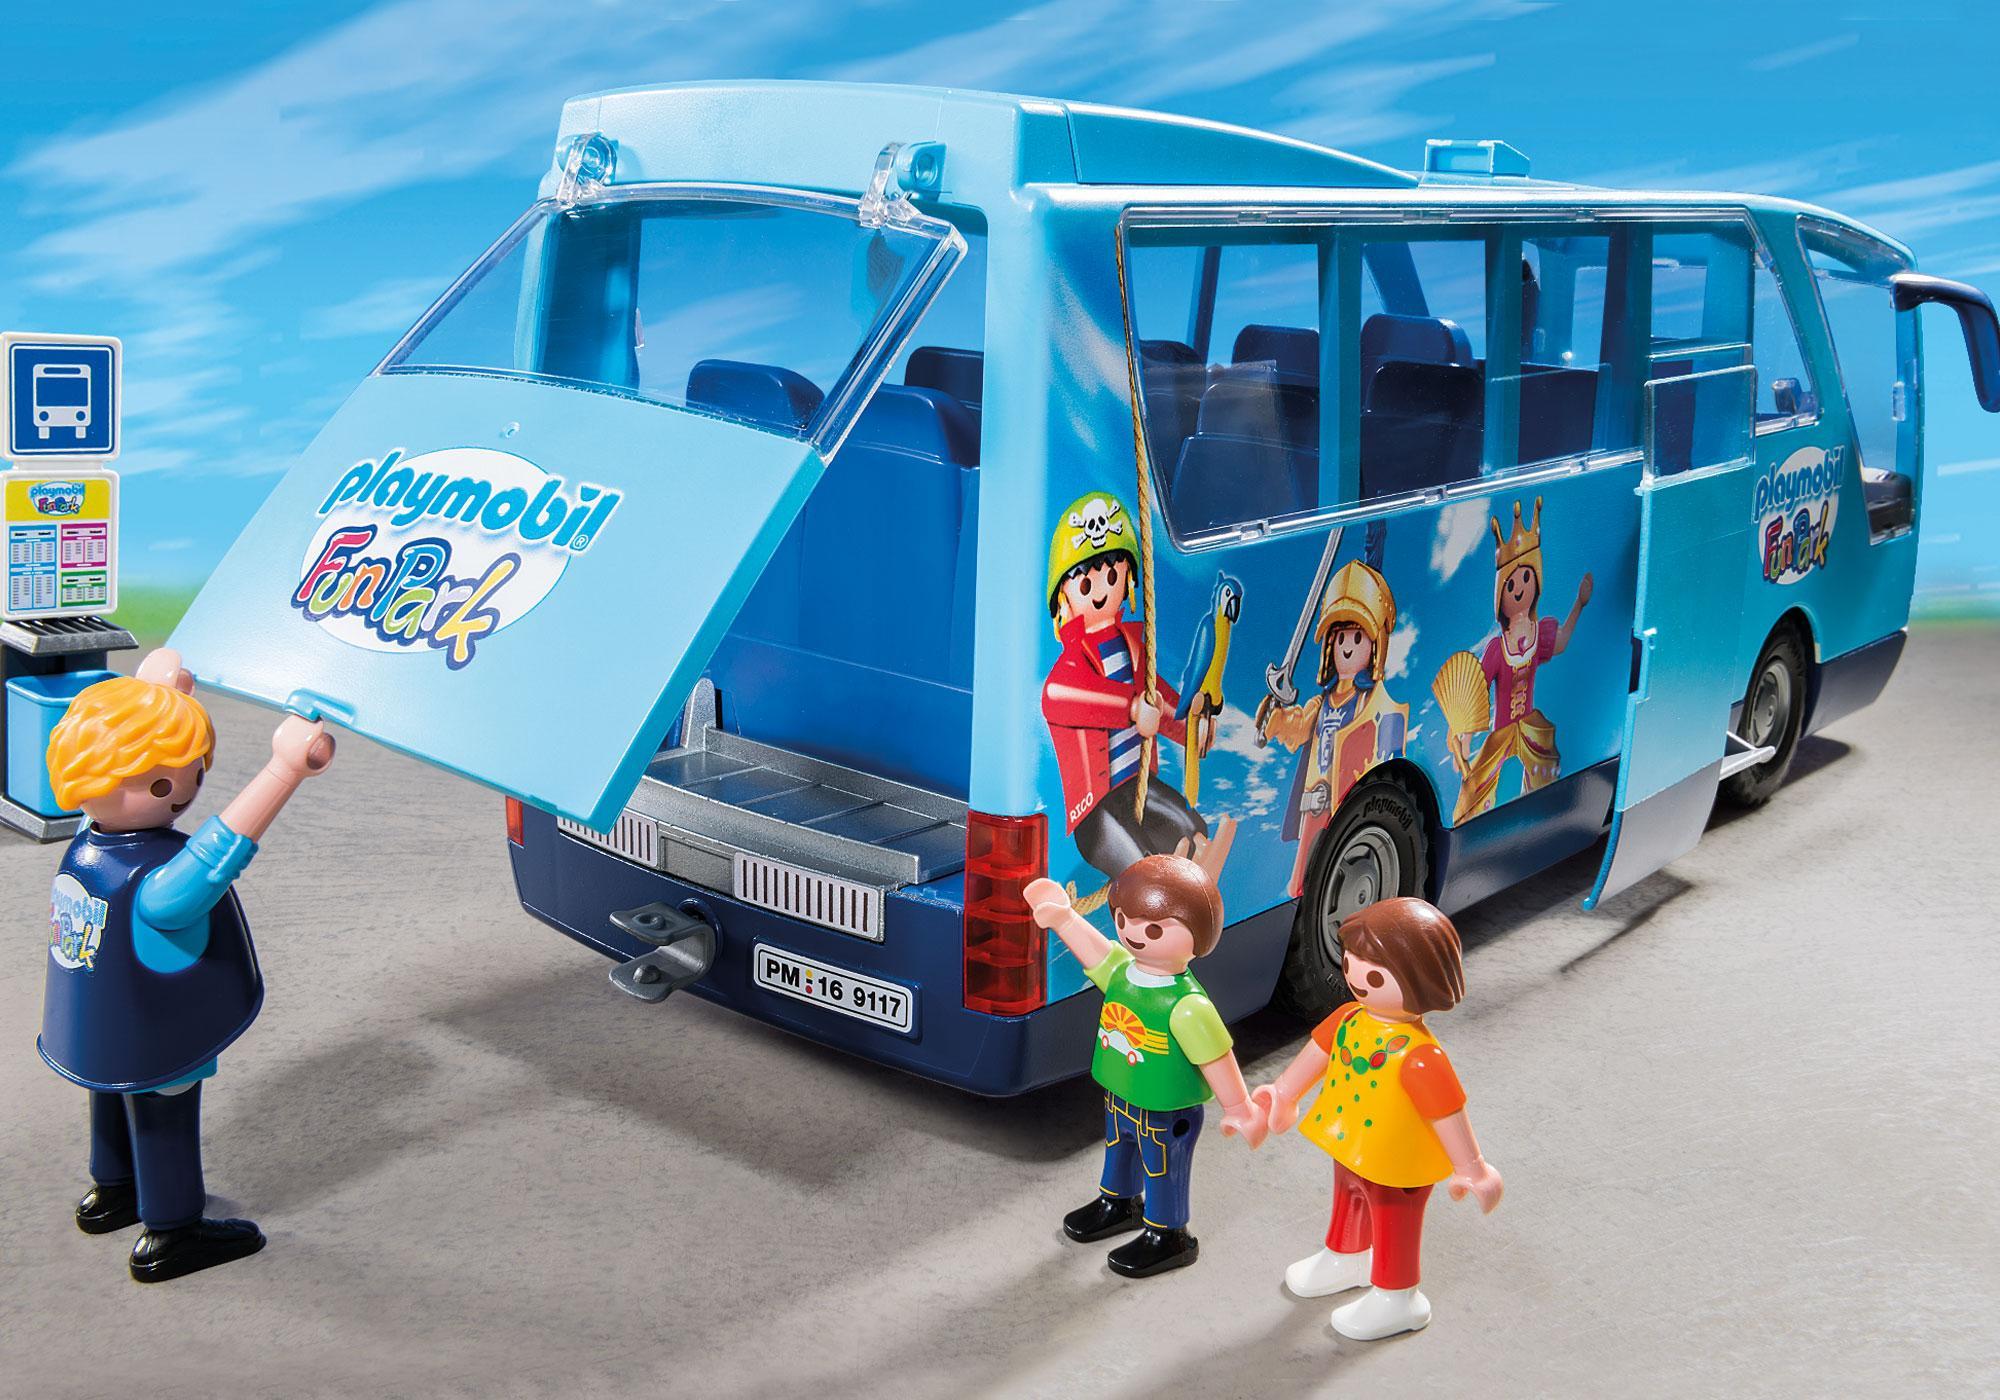 http://media.playmobil.com/i/playmobil/9117_product_extra3/PLAYMOBIL-FunPark Bus